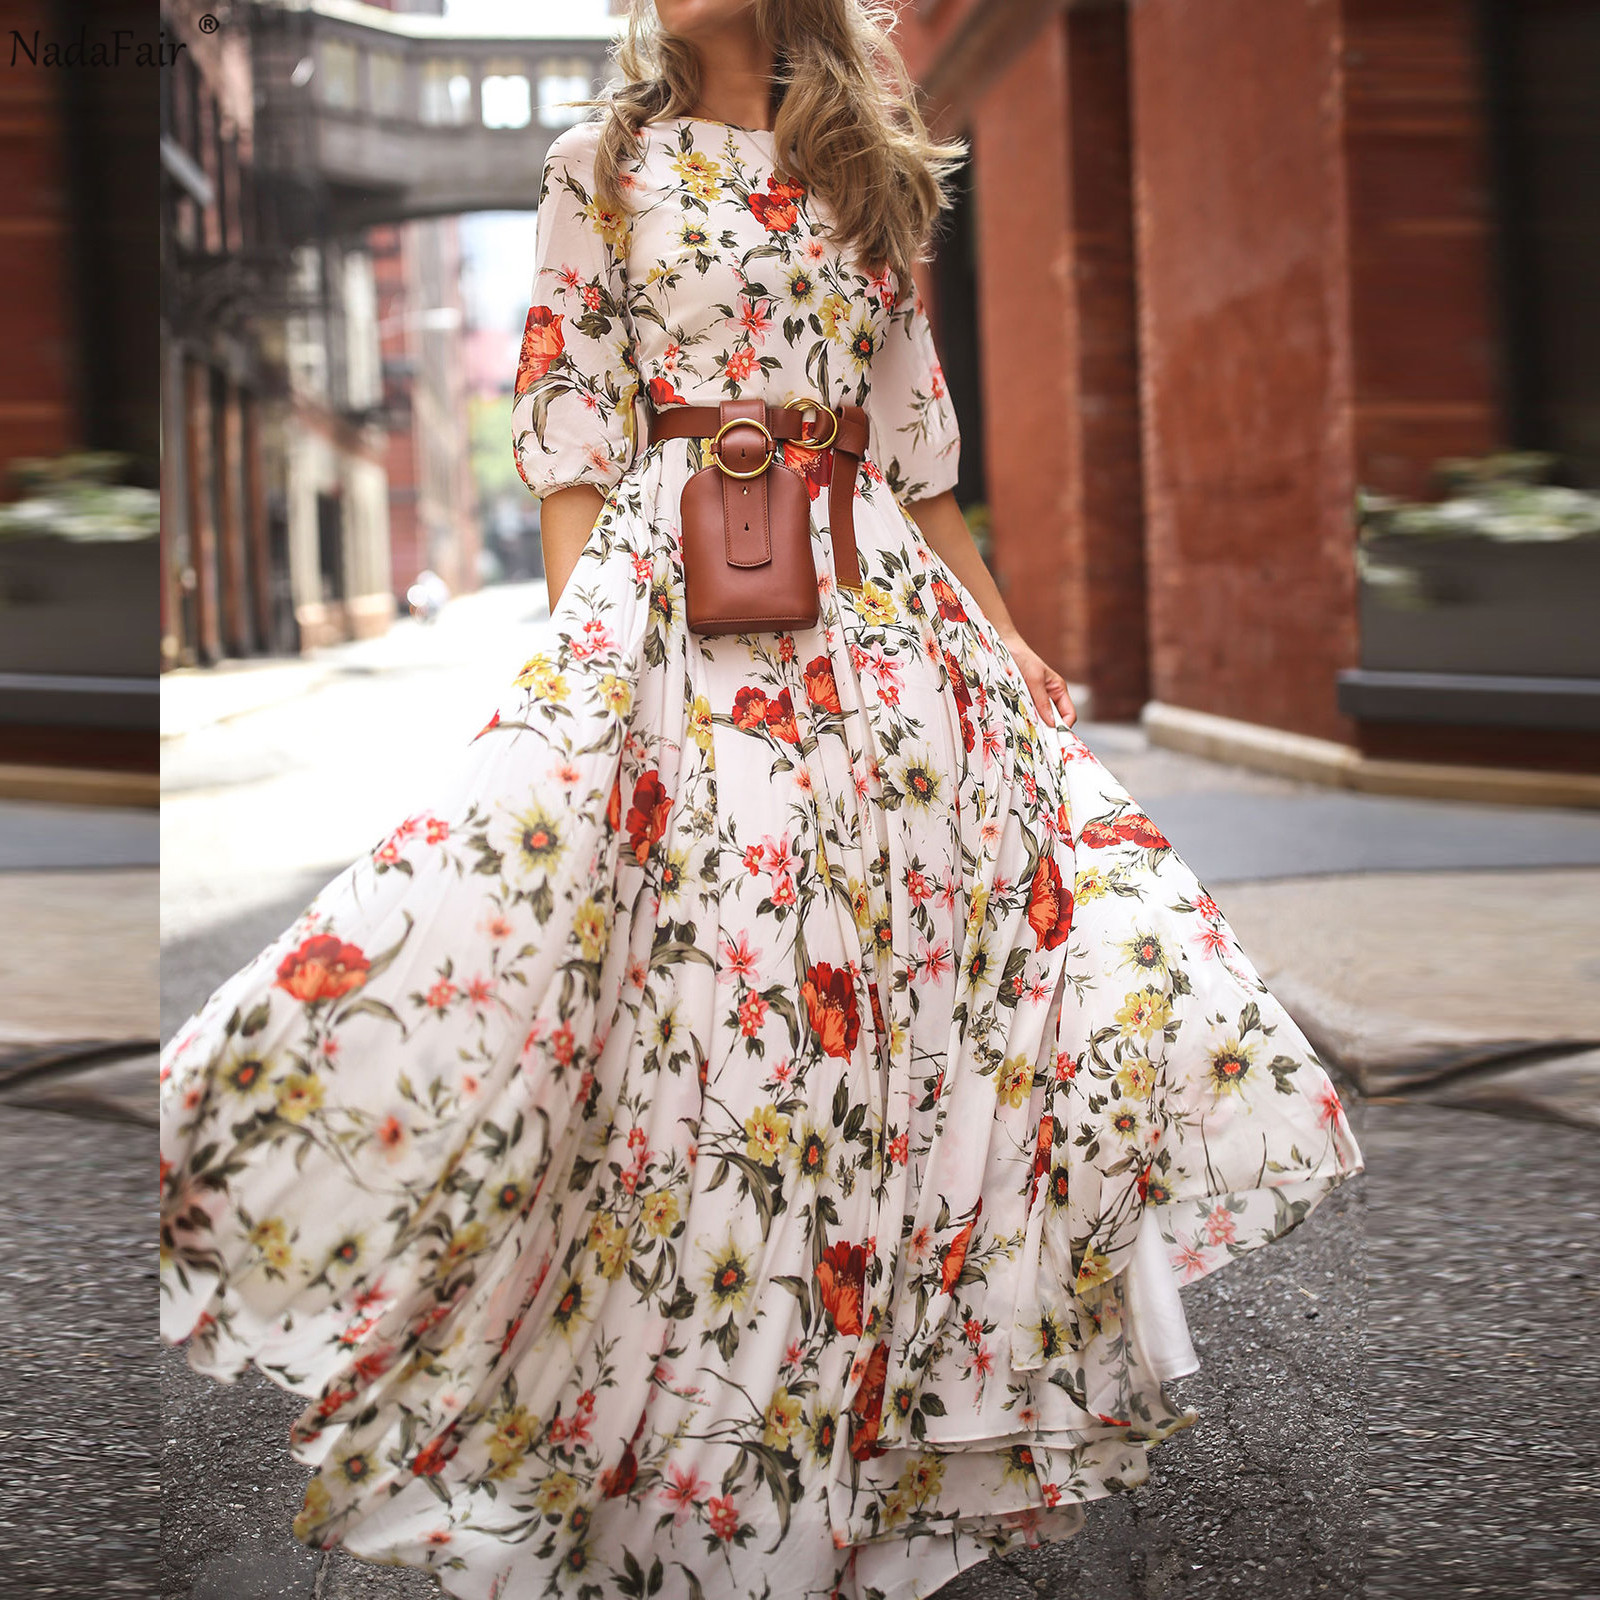 Nadafair Boho Dress Summer Women Long Elastic High Waist O Neck Printed Elegant Beach Vacation Floral Maxi Dresses Woman Vestido